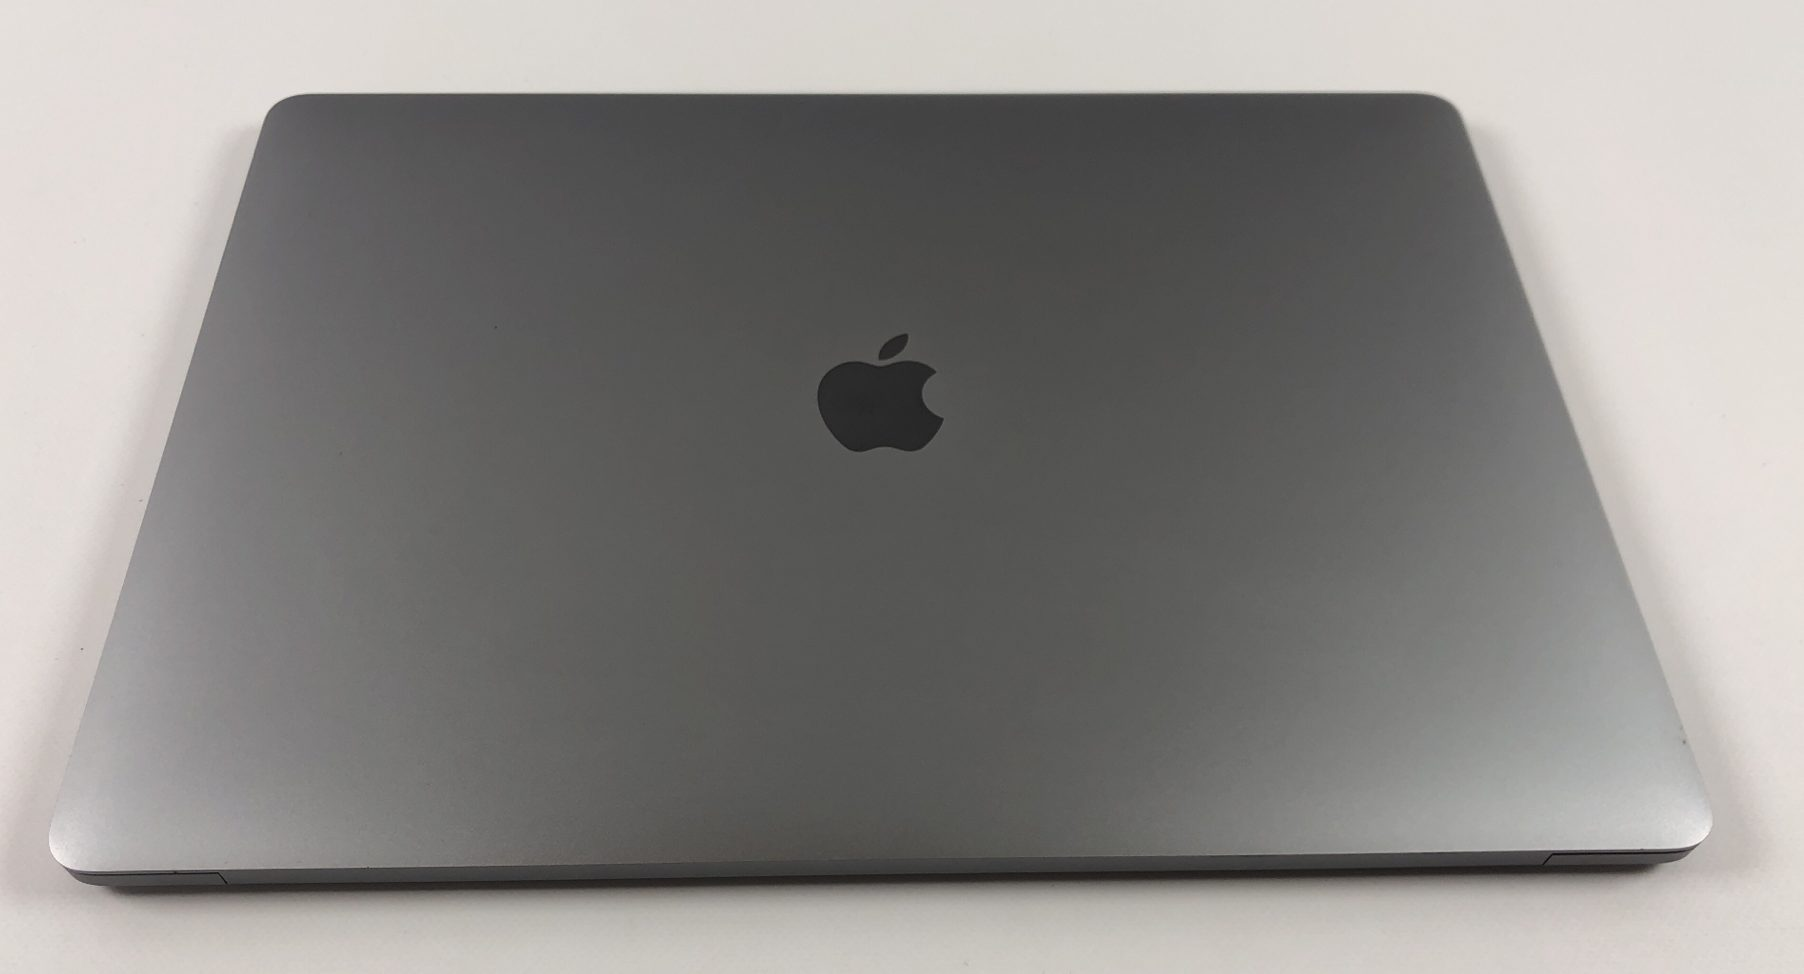 "MacBook Pro 15"" Touch Bar Late 2016 (Intel Quad-Core i7 2.9 GHz 16 GB RAM 2 TB SSD), Space Gray, Intel Quad-Core i7 2.9 GHz, 16 GB RAM, 2 TB SSD, Kuva 3"